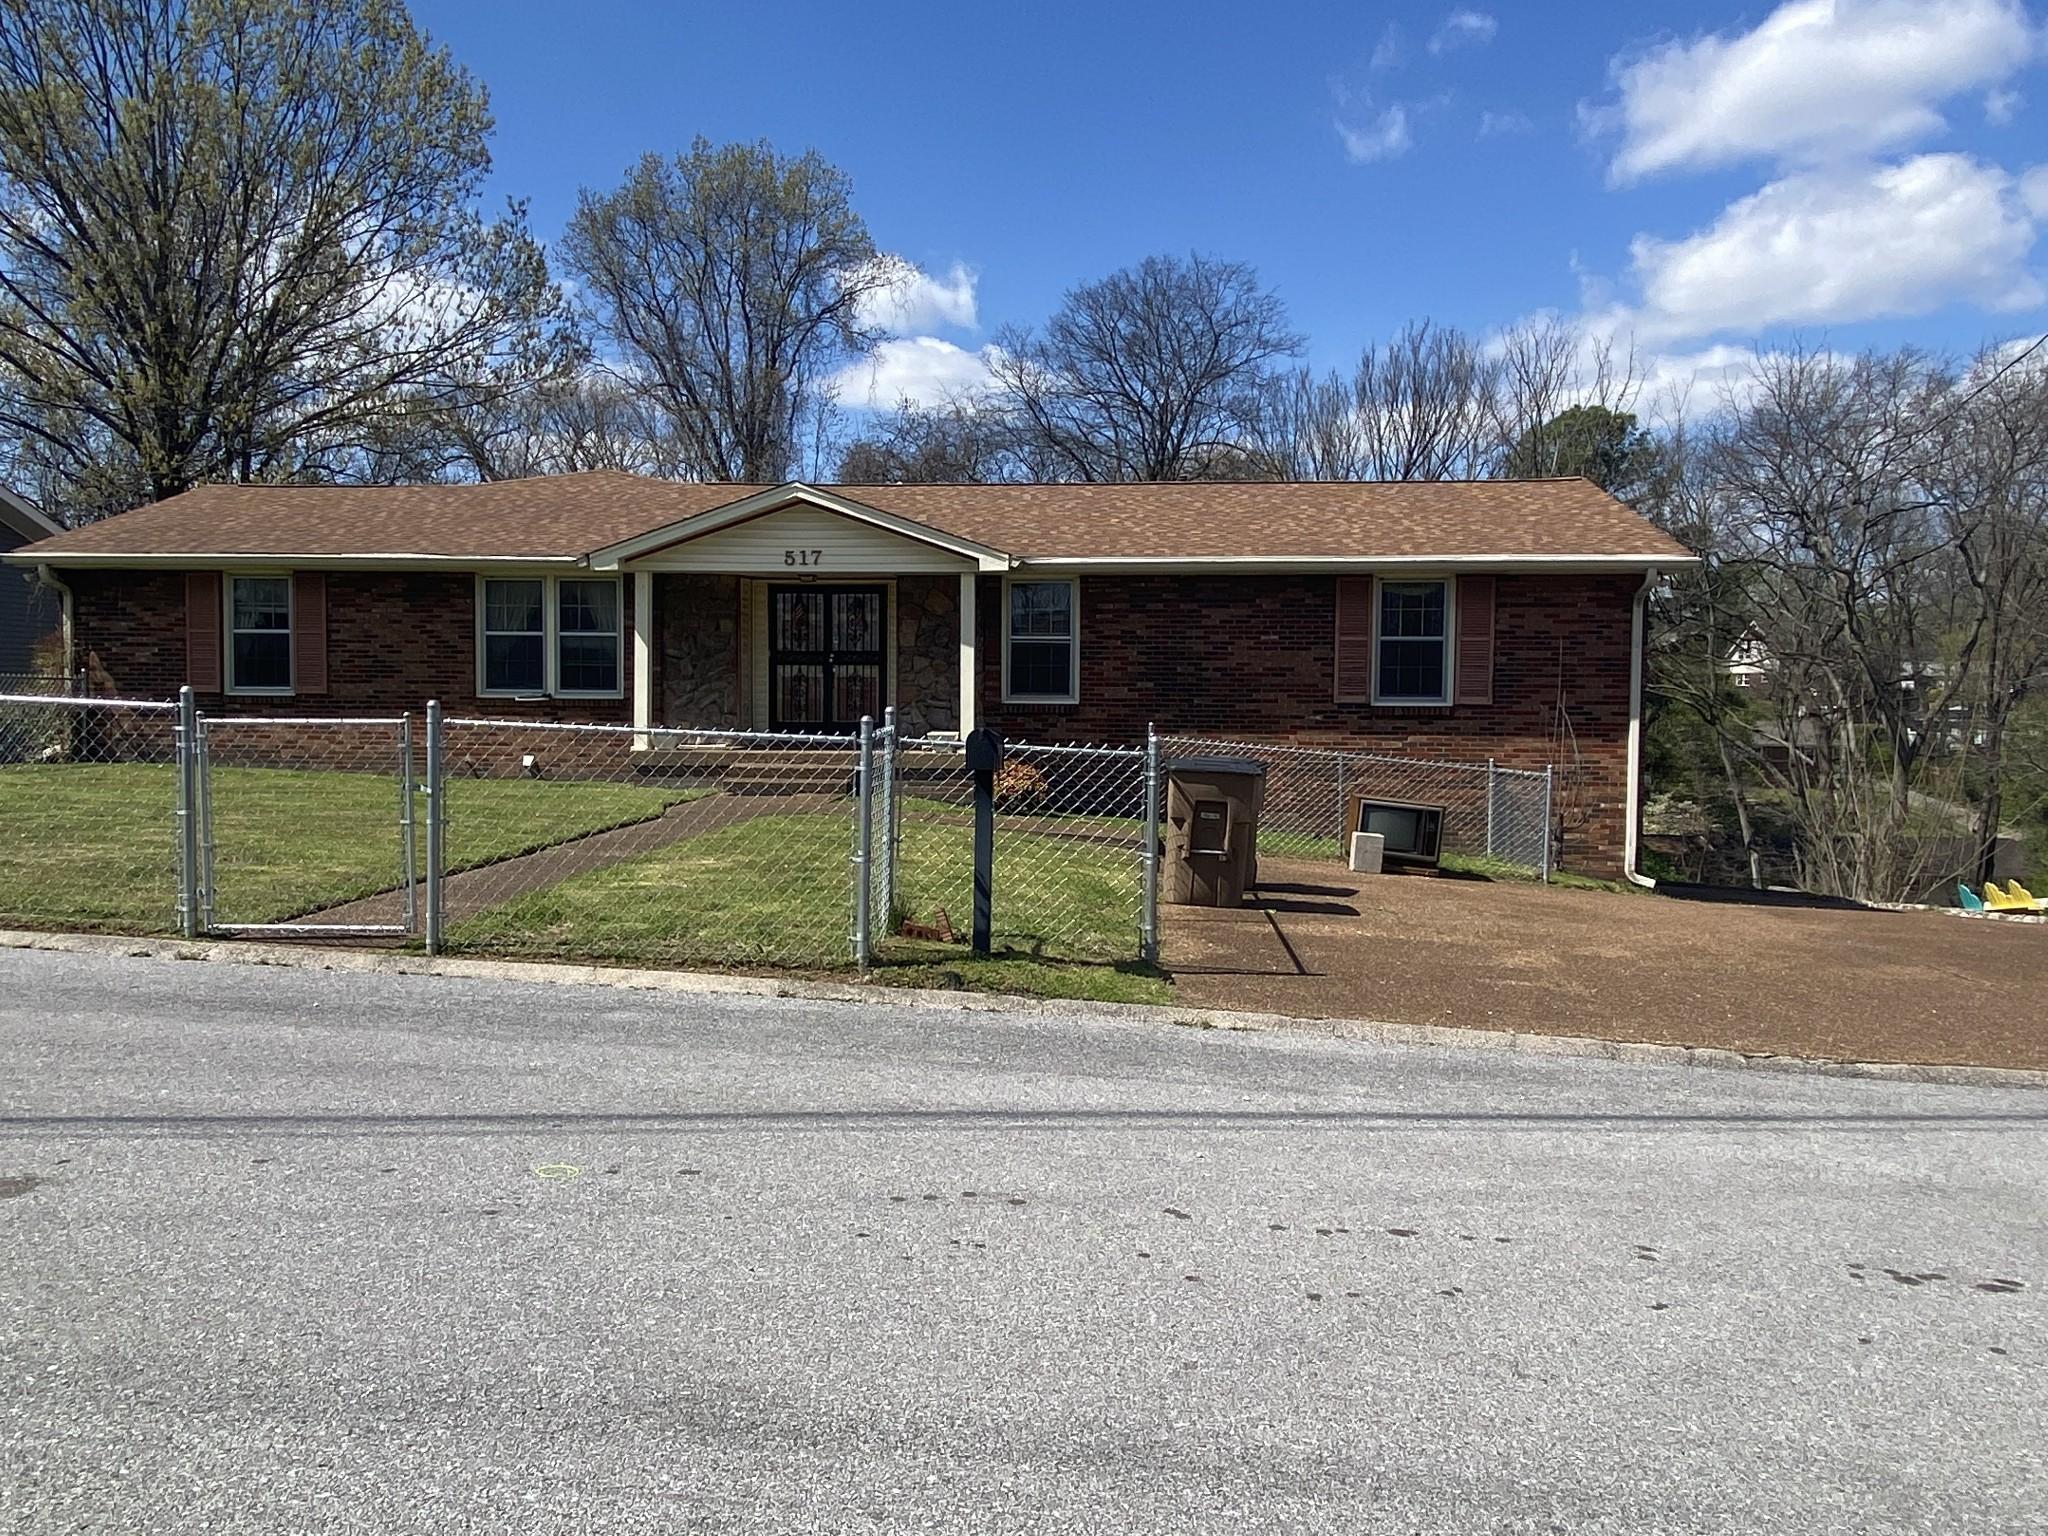 517 Foothill Dr Property Photo - Nashville, TN real estate listing